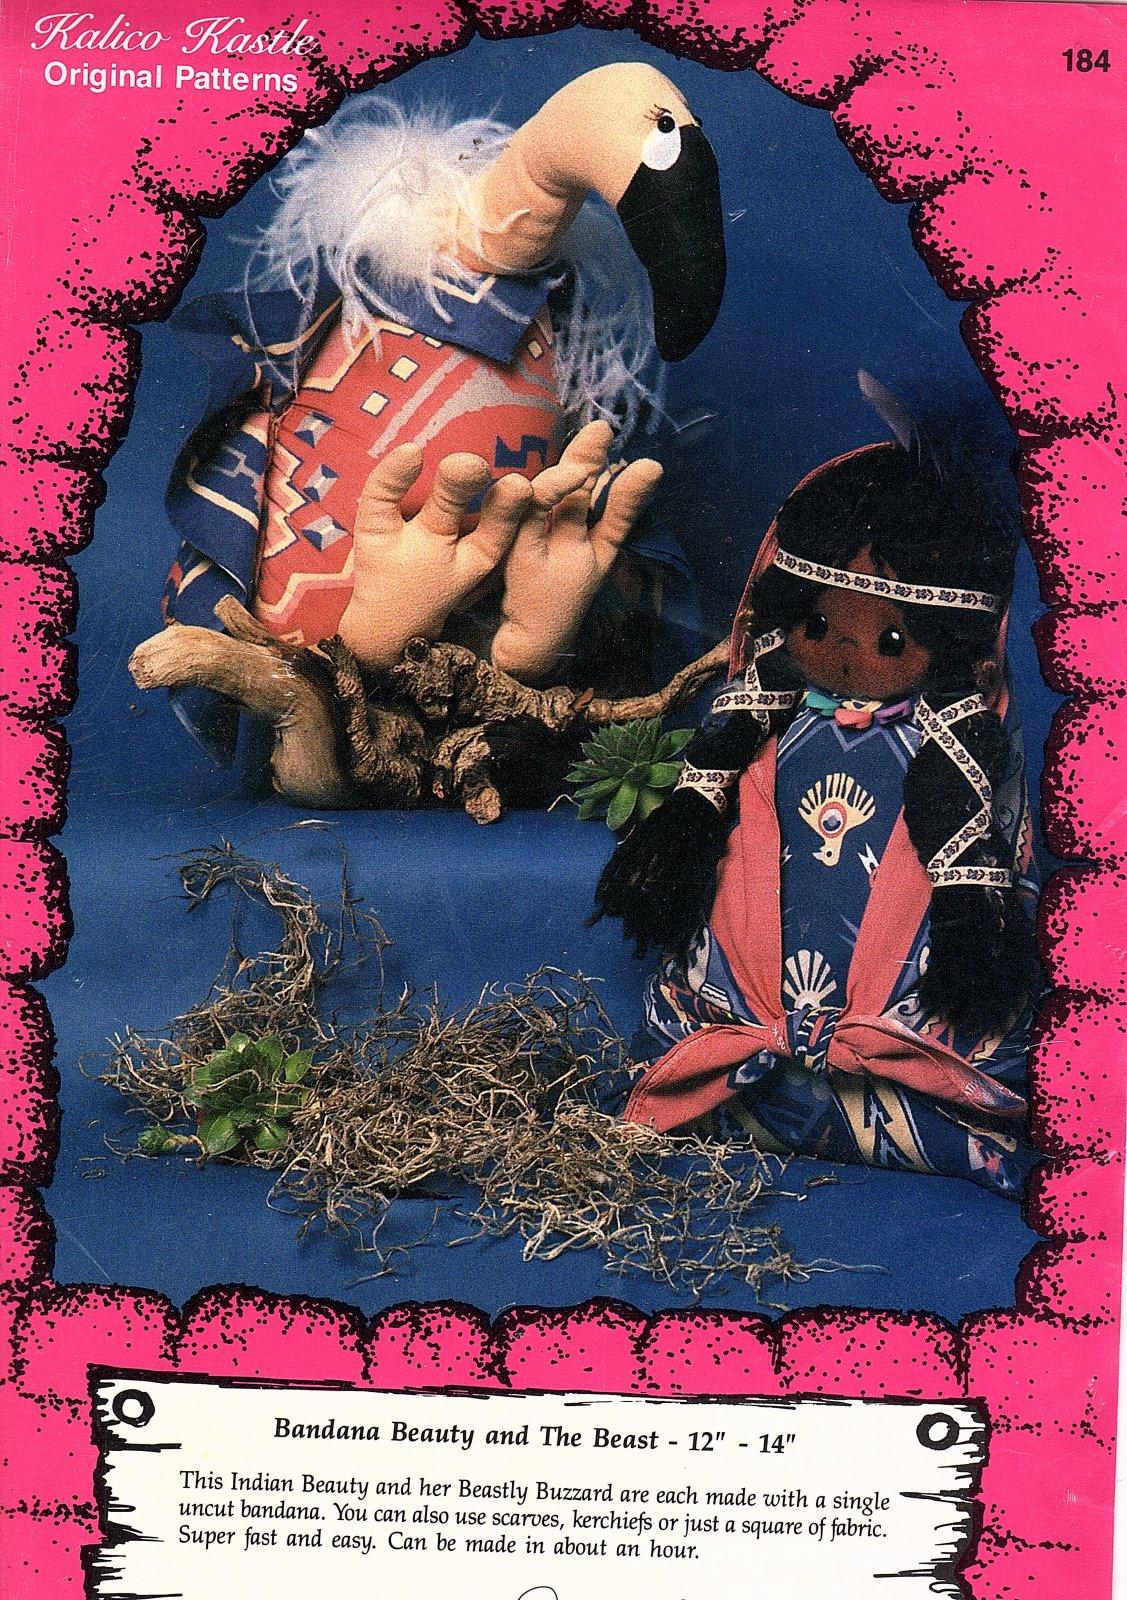 Bandana Beauty & the Beast 12 - 14 Tall Dolls - Kalico Kastle Original Patterns